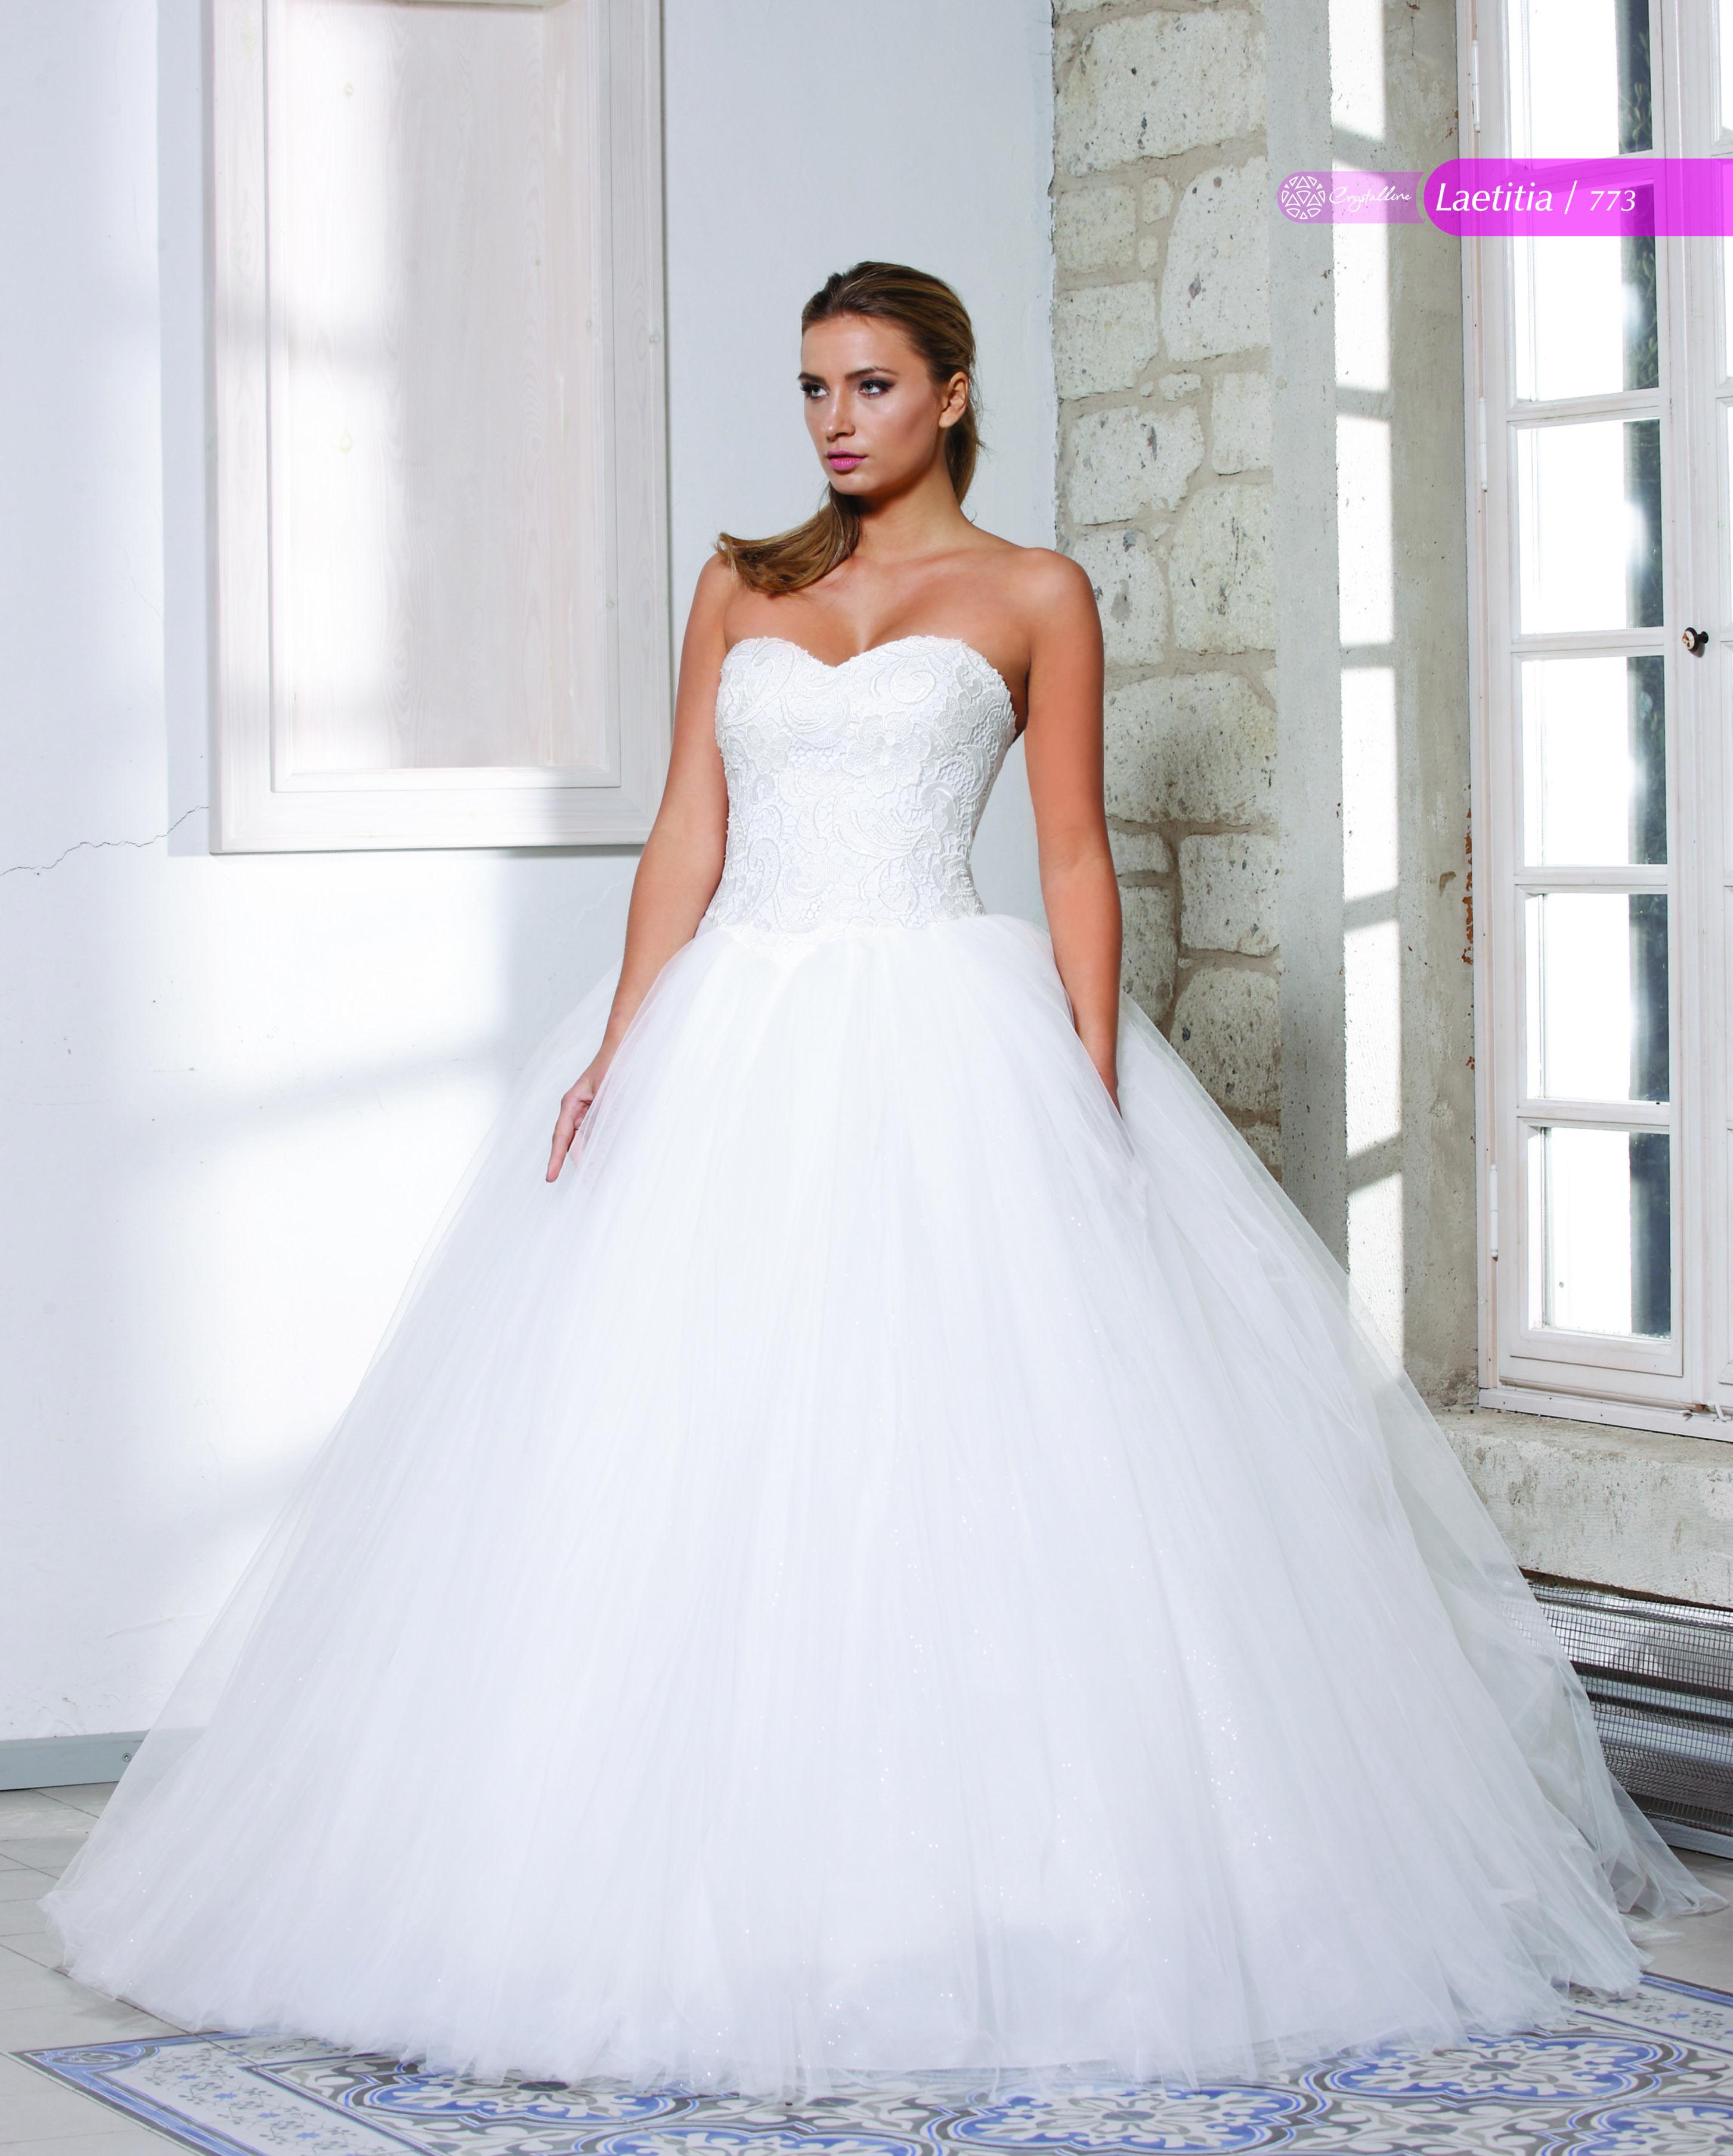 Breathtaking Ball gown / wedding dress called Laetitia by ...